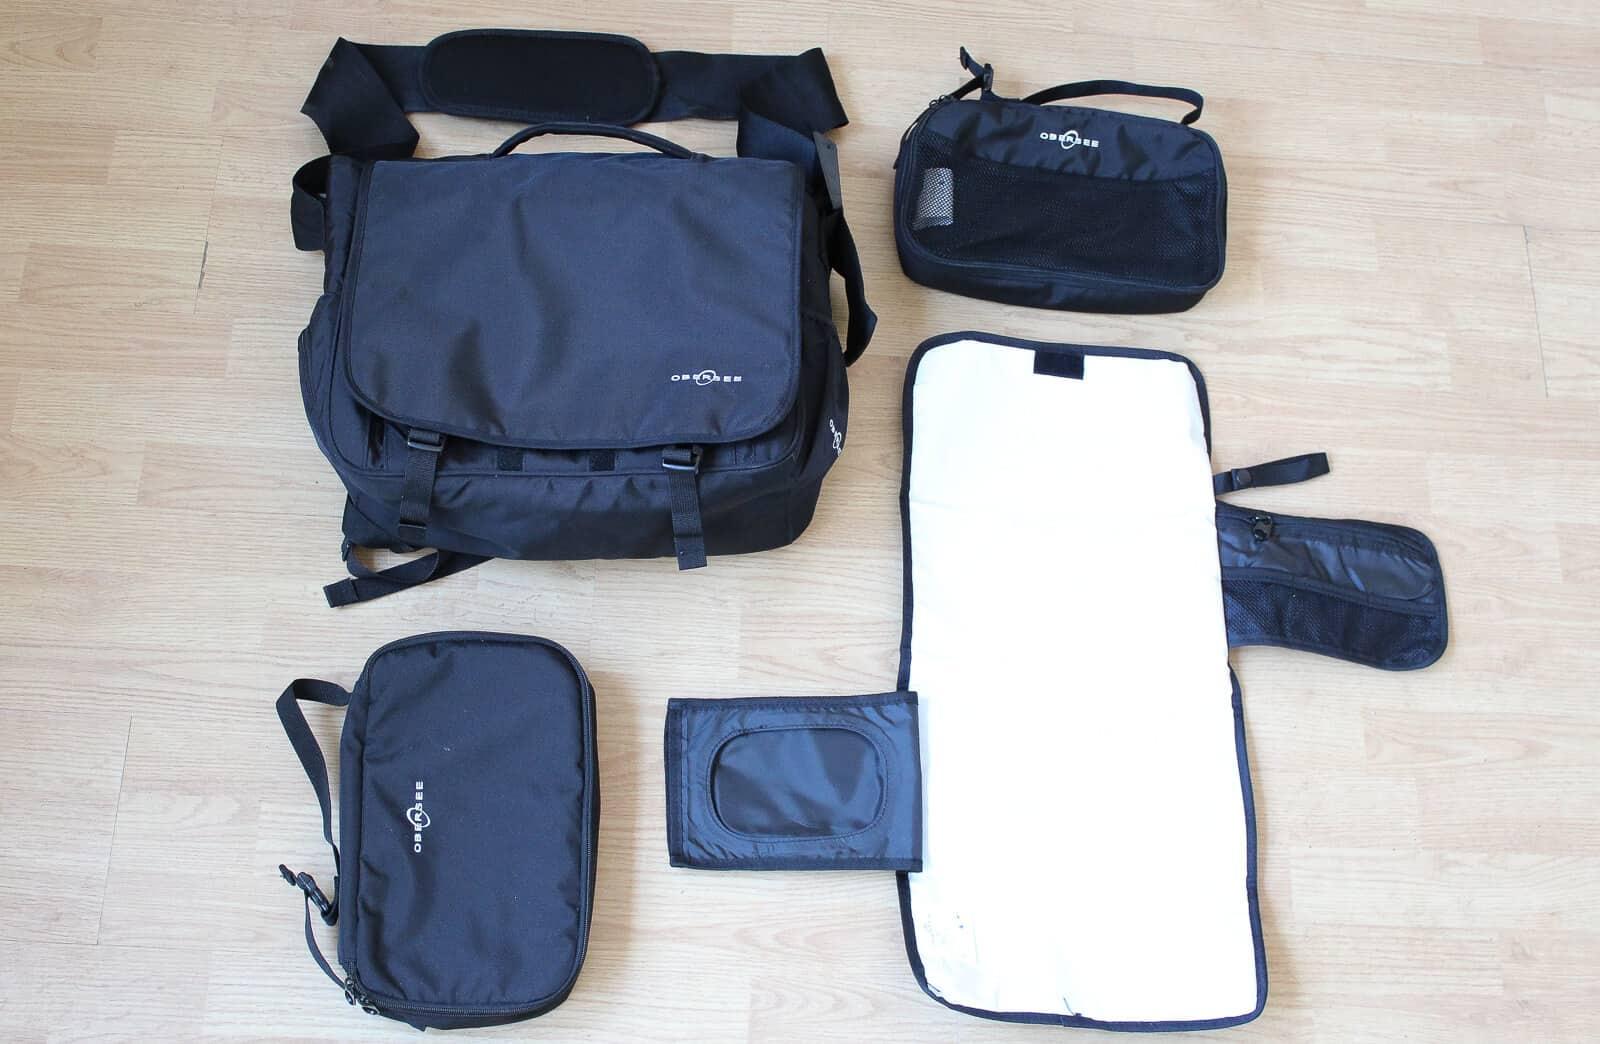 obersee madrid convertible large backpack diaper bag